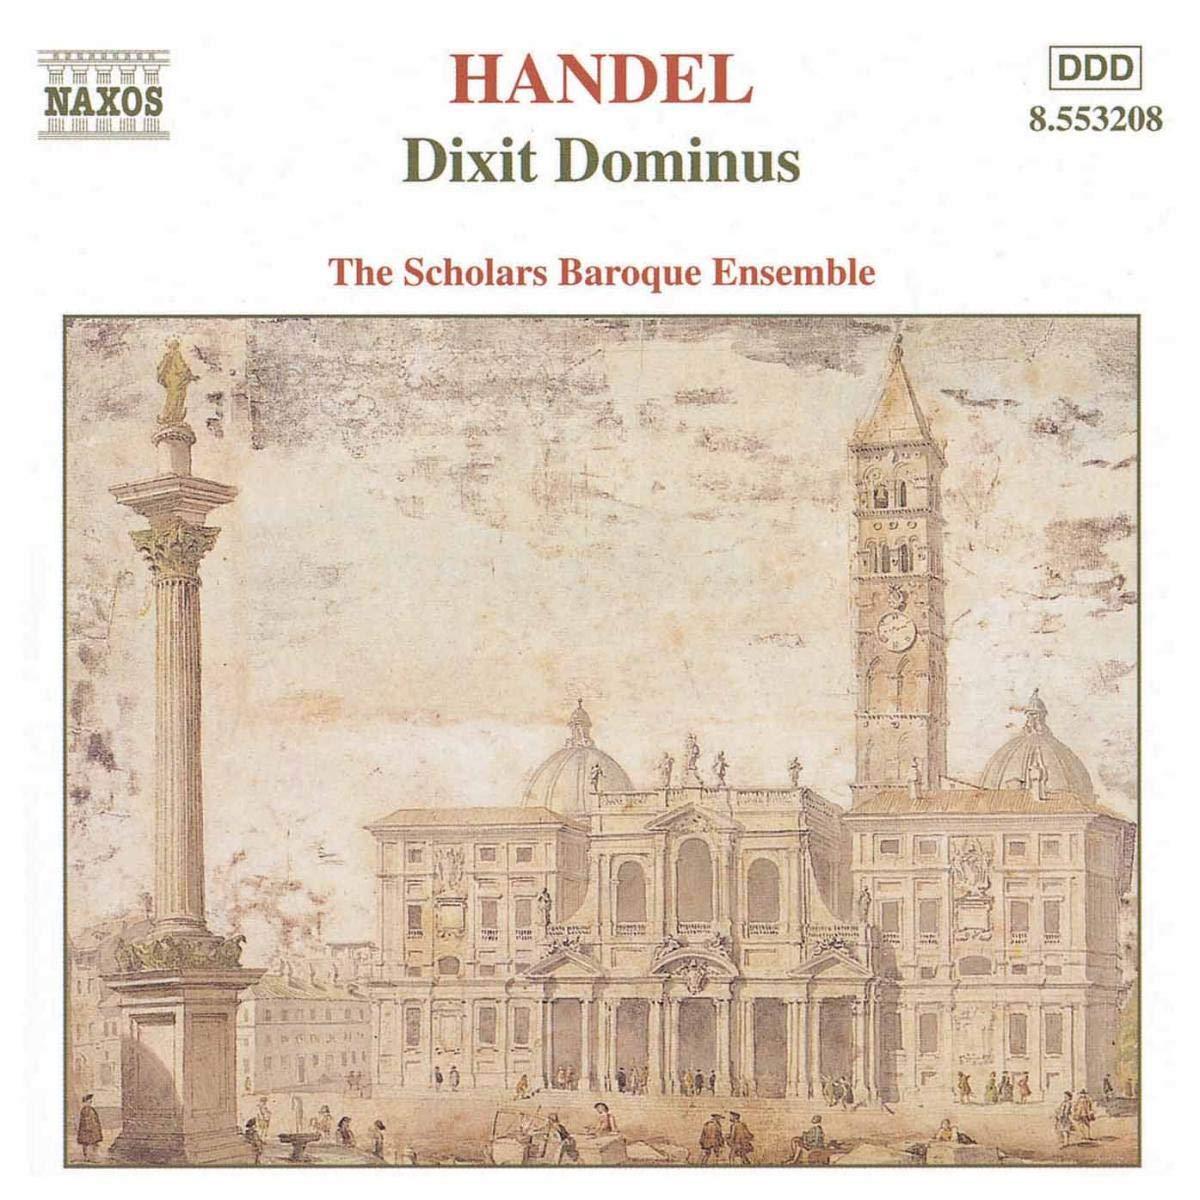 Dixit Dominus: Ensemble The Scholars Baroque, Georg Friedrich Händel: Amazon.es: Música